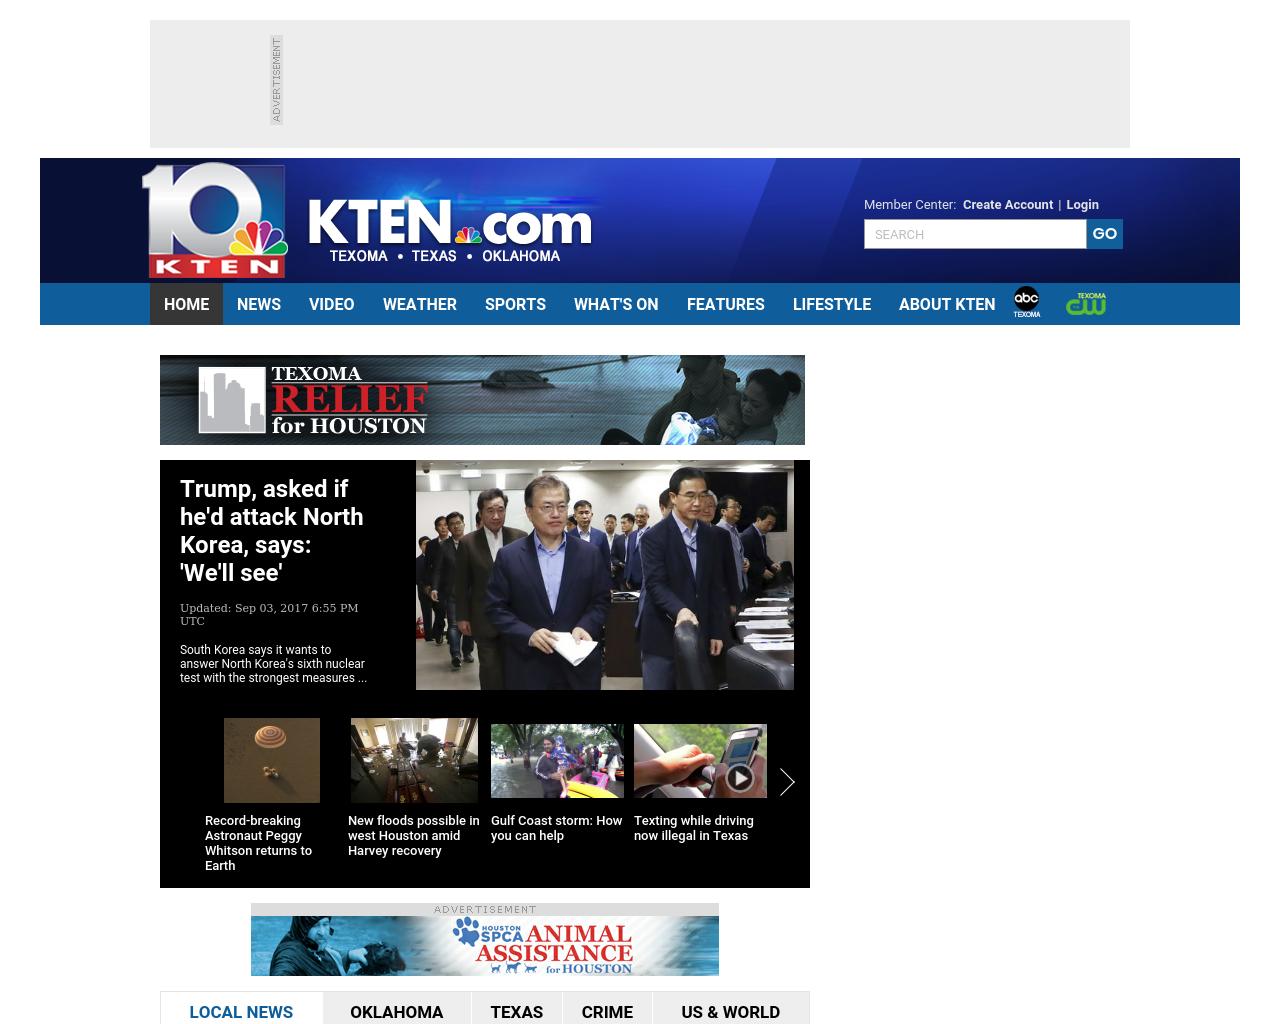 KTEN-MEDIA-Advertising-Reviews-Pricing